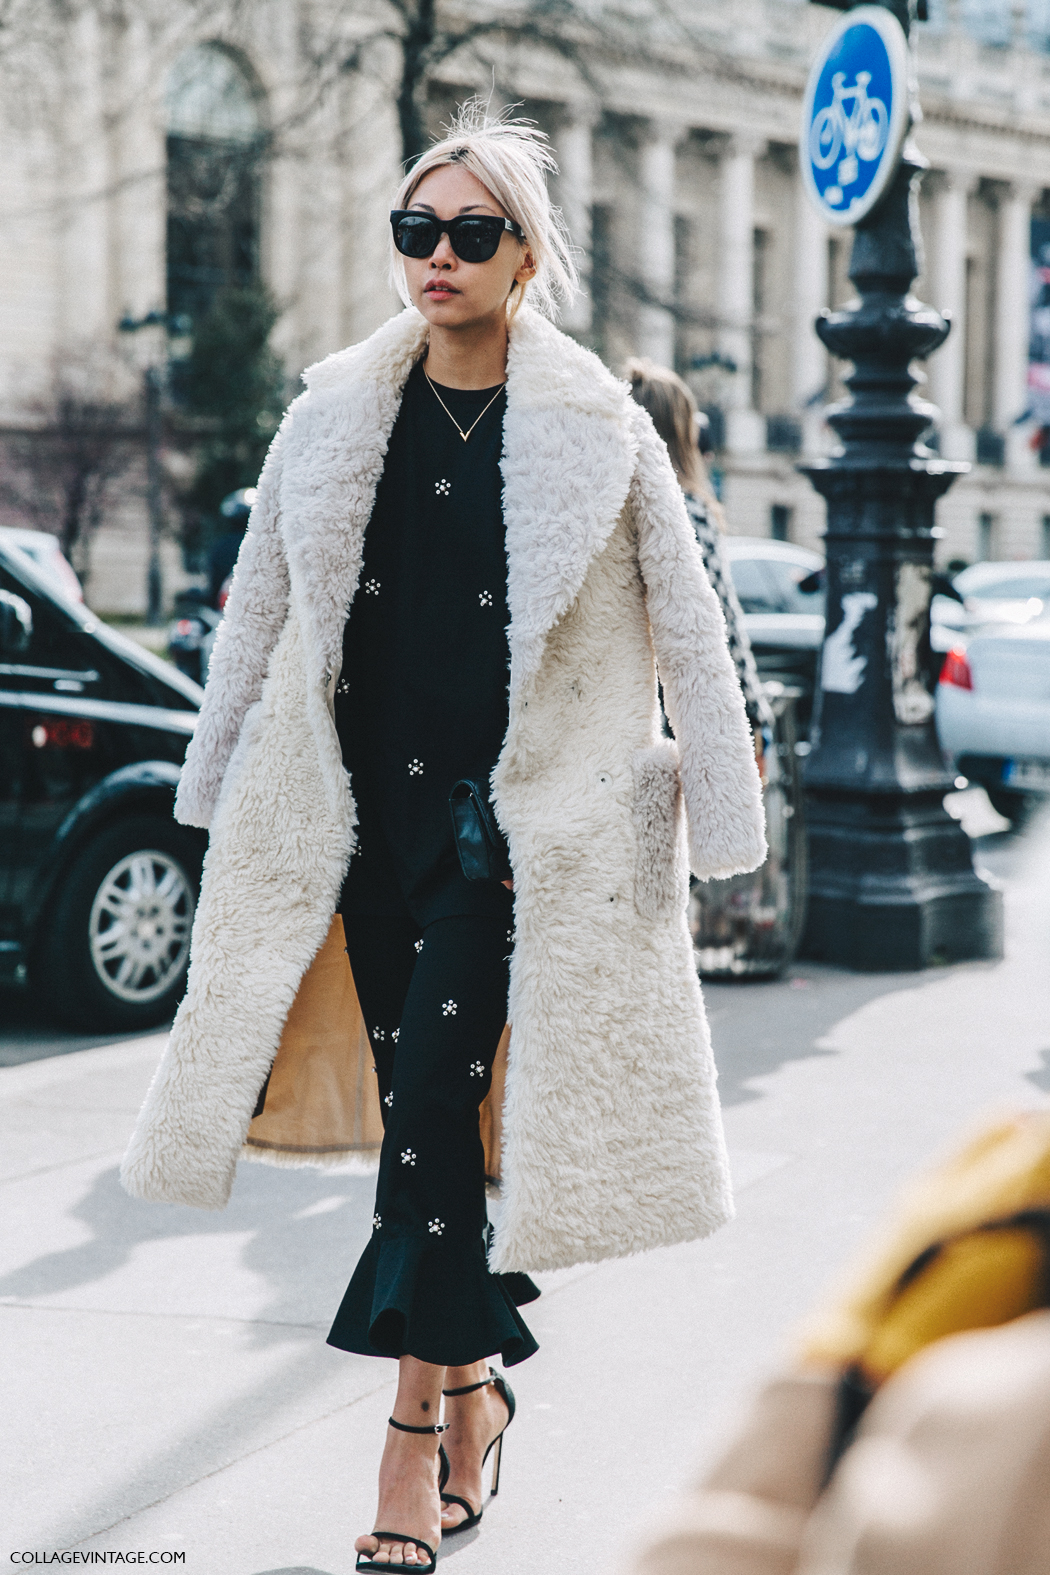 PFW-Paris_Fashion_Week_Fall_2016-Street_Style-Collage_Vintage-White_Fur_COat-2